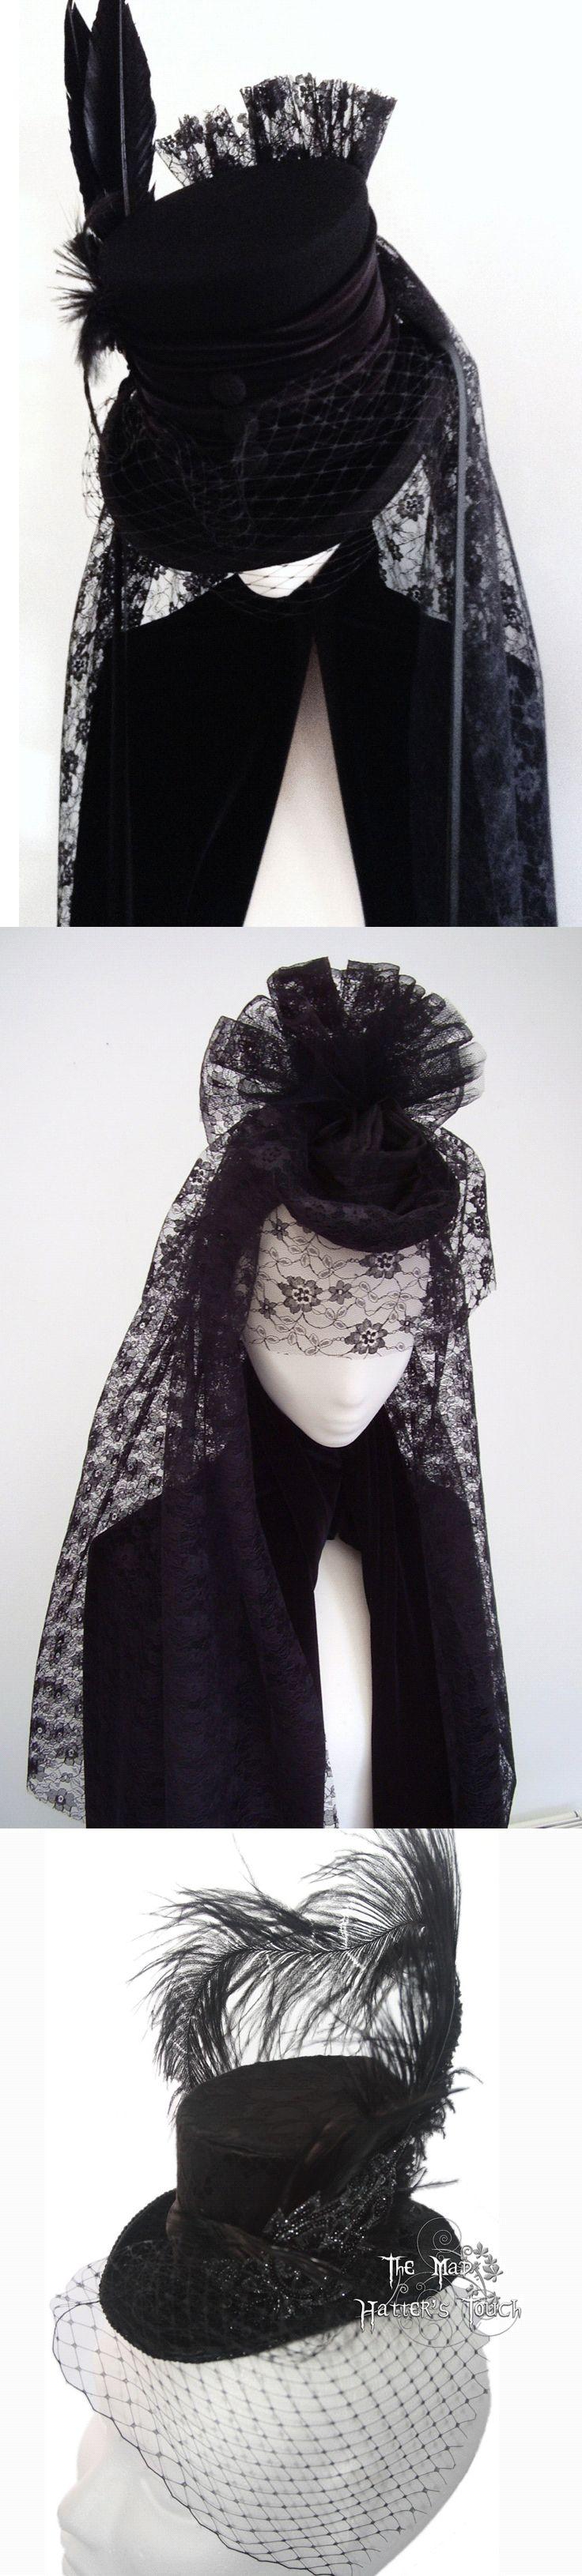 Shop Halloween gothic Victorian hats for women at RebelsMarket!